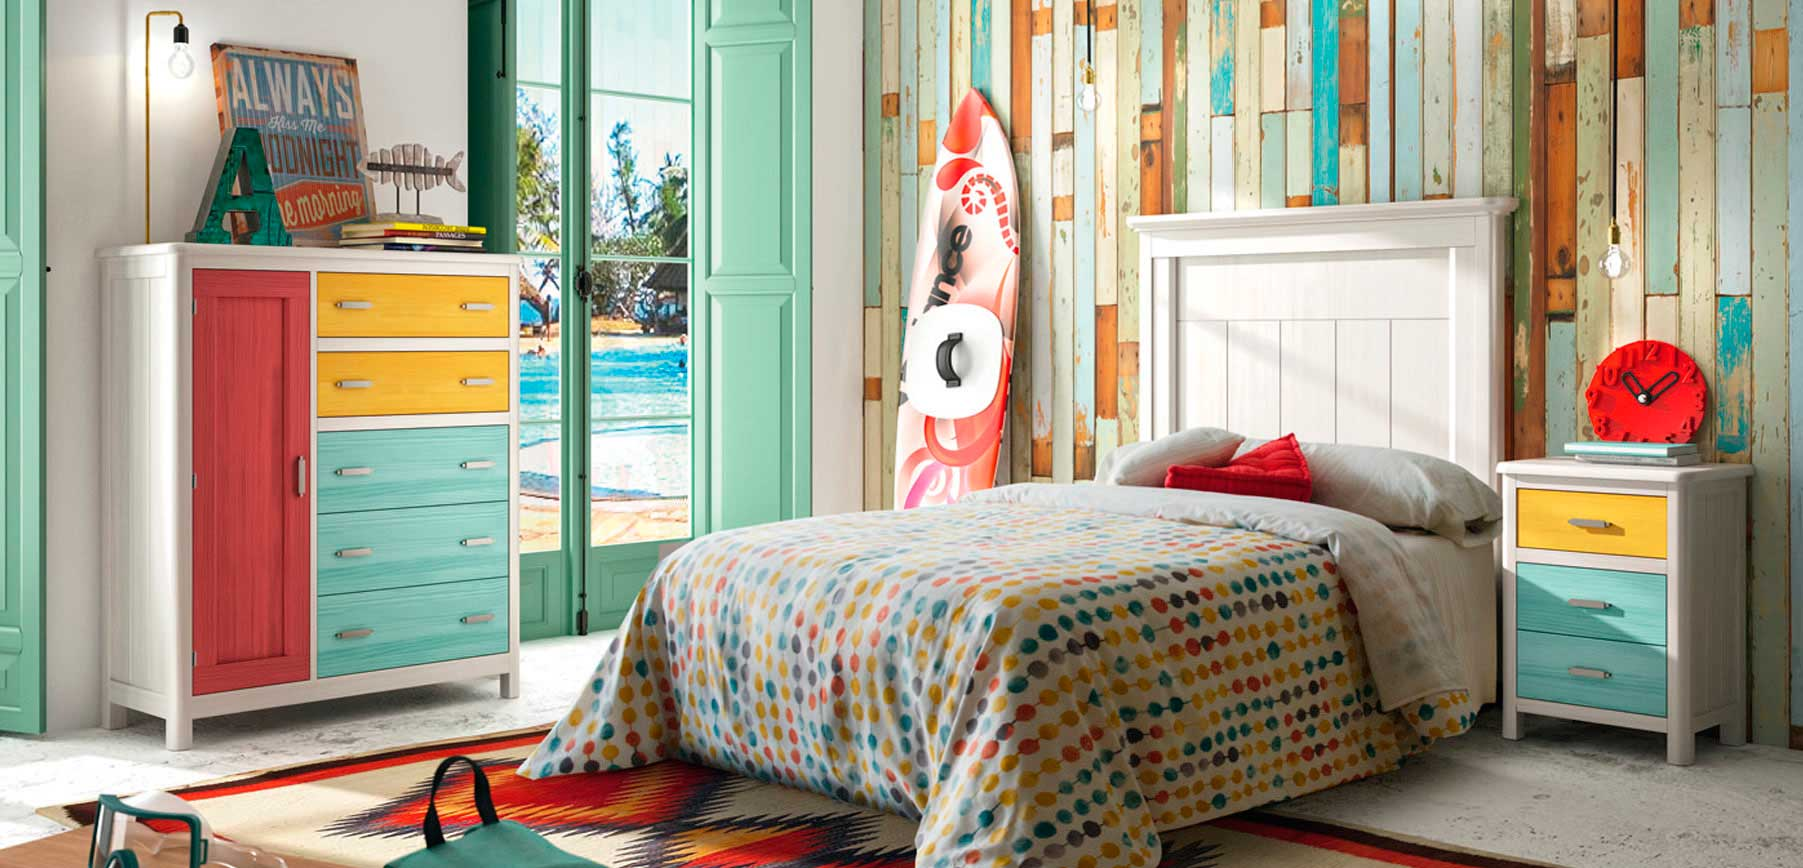 Muebles GRUPOSEYS - Muebles | Furniture | Meubles | мебель seys-5-optim Inicio